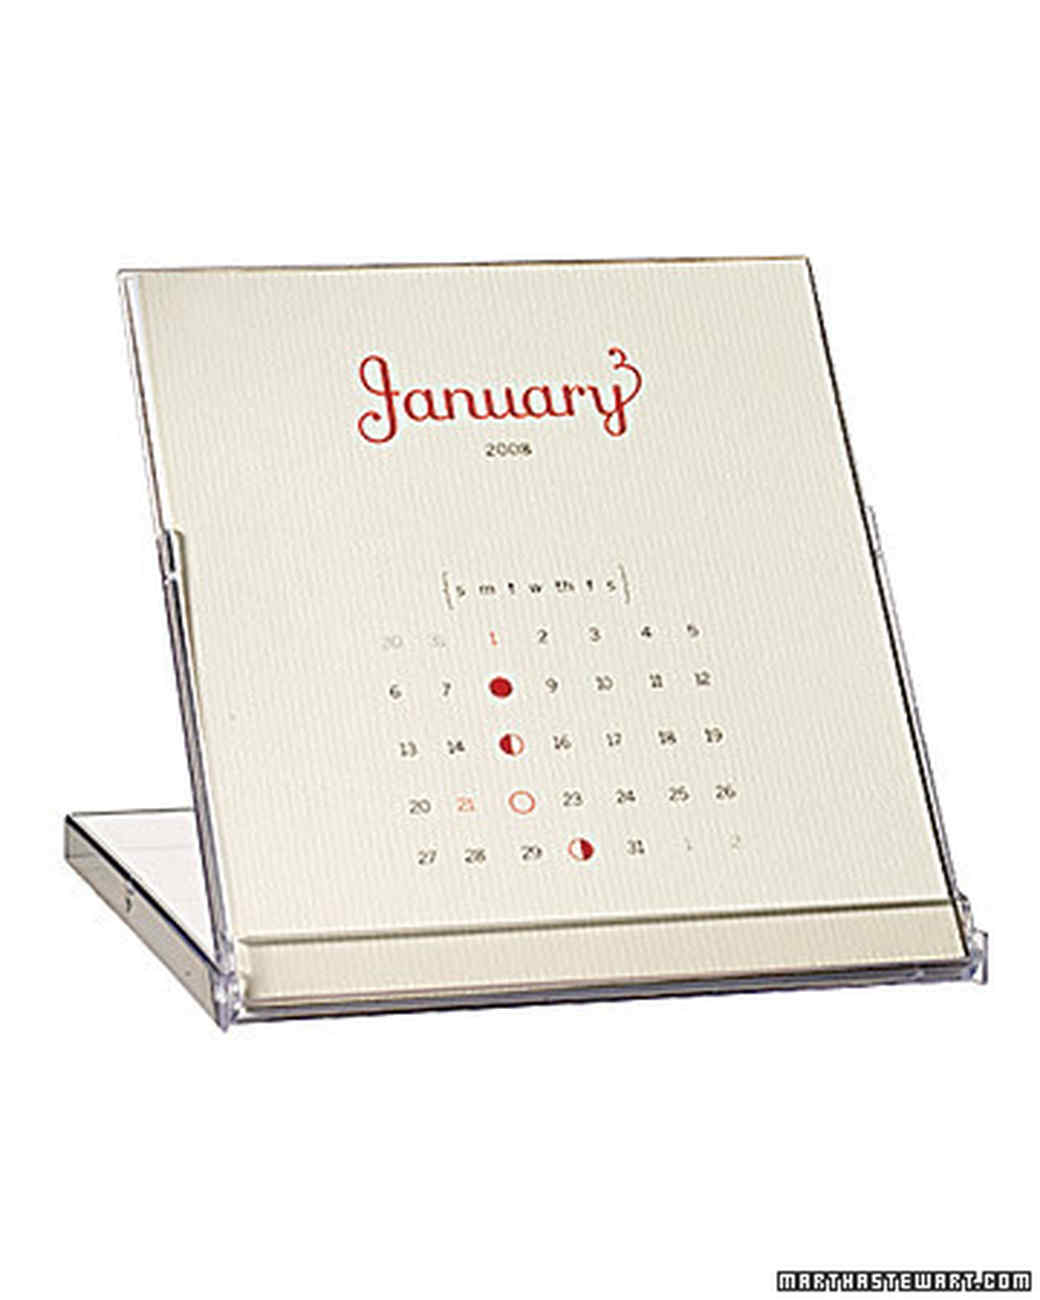 bp103410_1107_calendarsilo.jpg